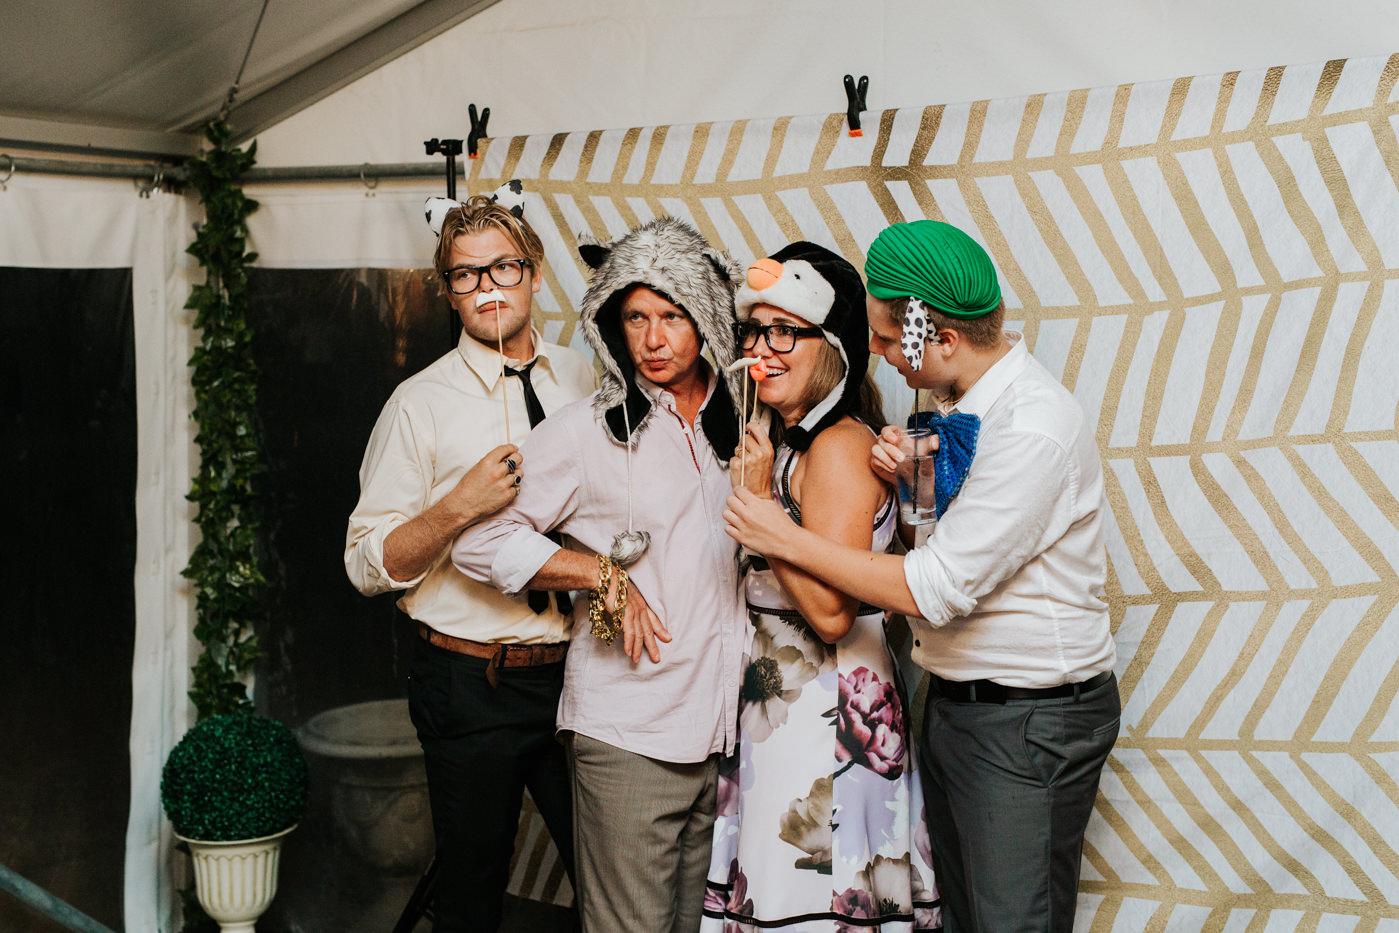 Nick & Vanezza - Fernbank Farm Wedding - Samantha Heather Photography-165.jpg